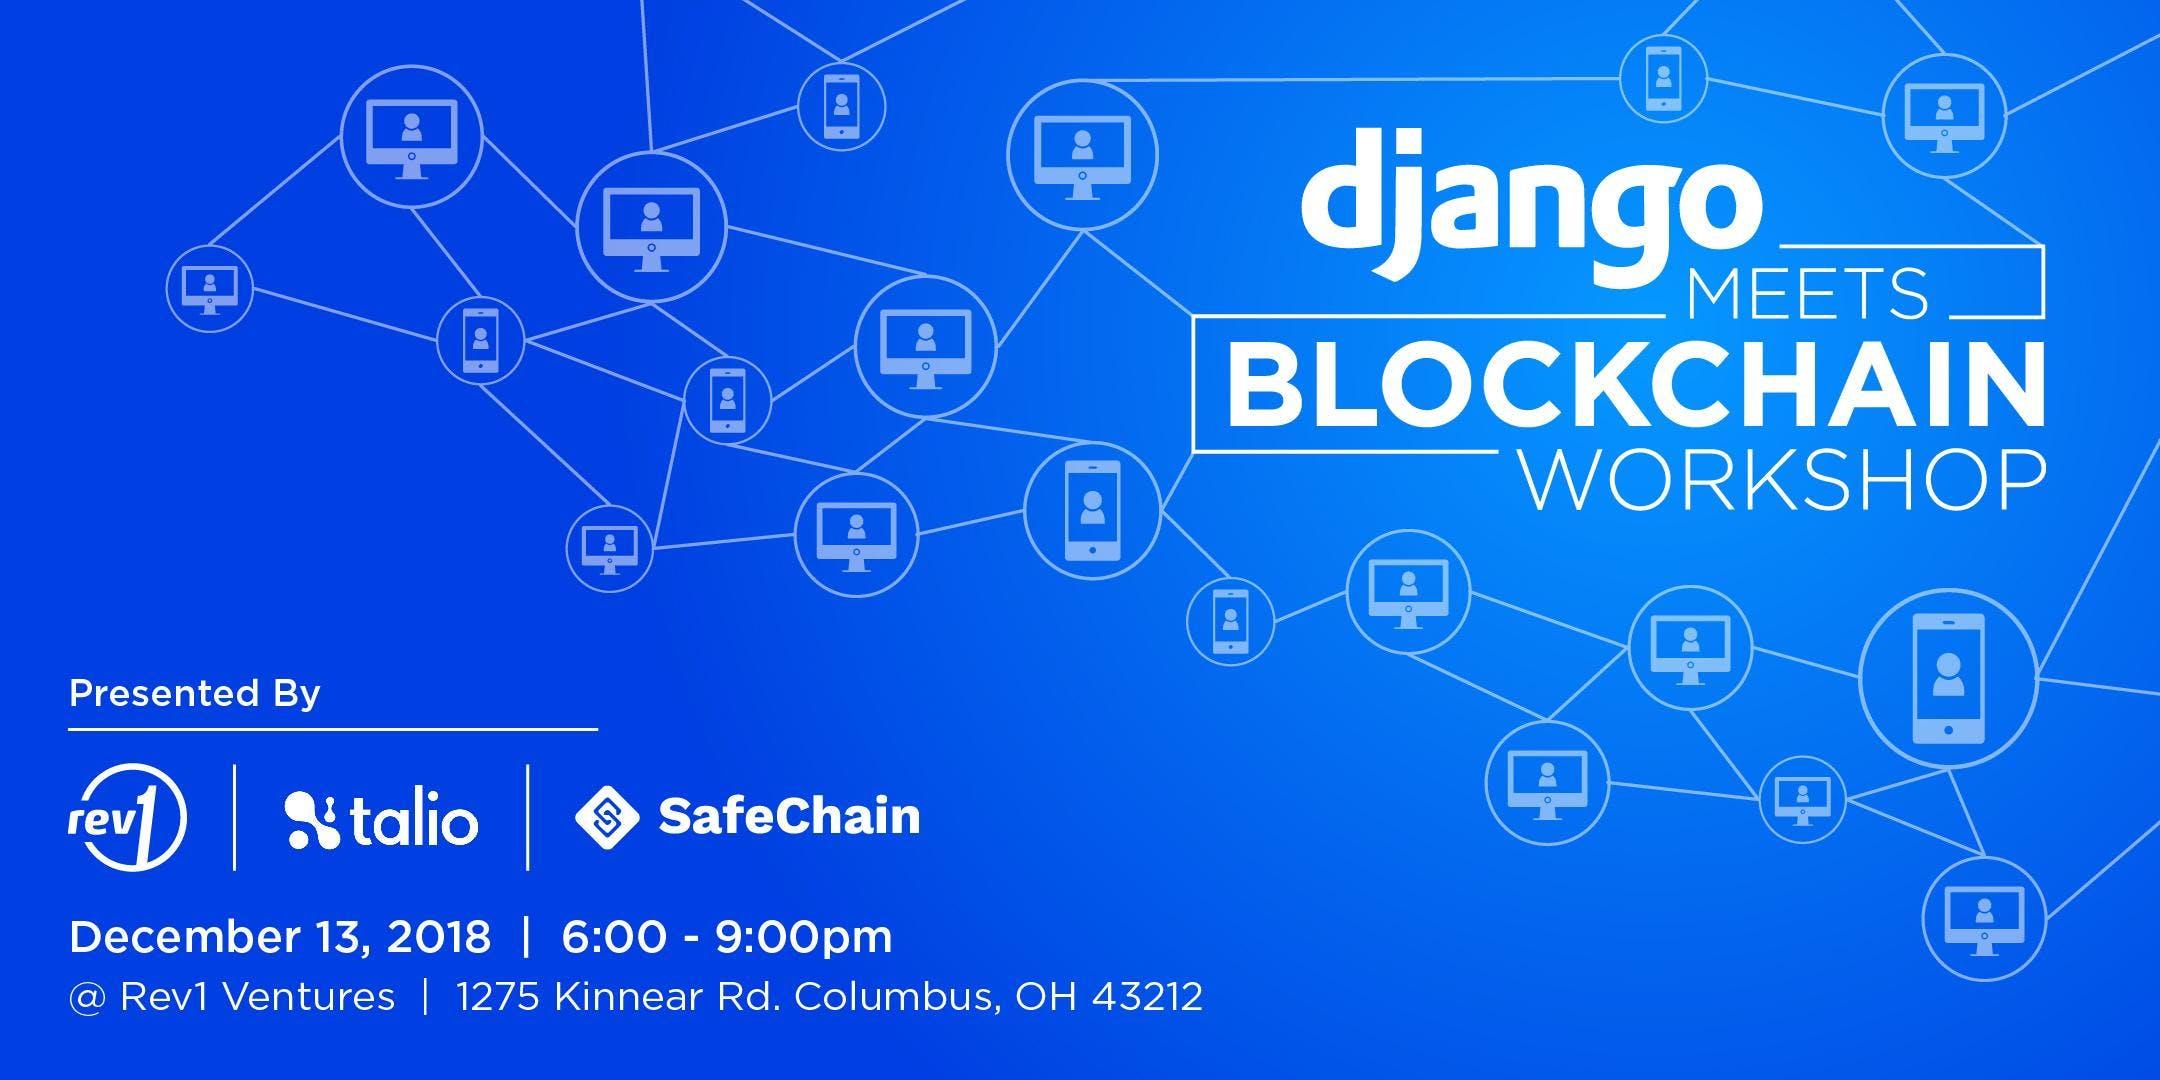 Django meets blockchain workshop - Dublin Entrepreneurial Center